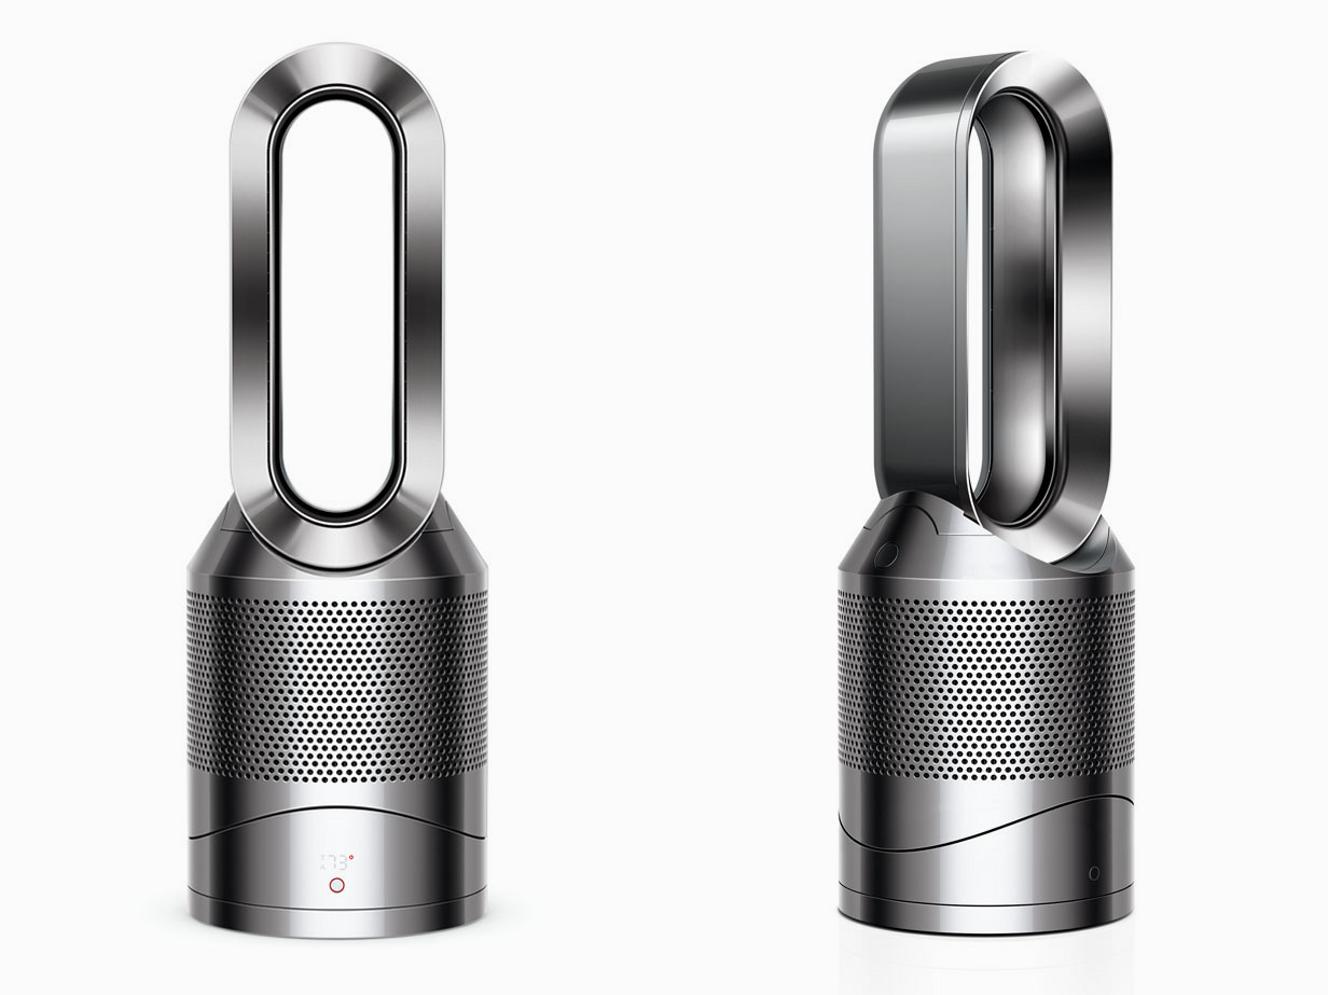 Dyson pure hot cool link purifier james dyson award 2015